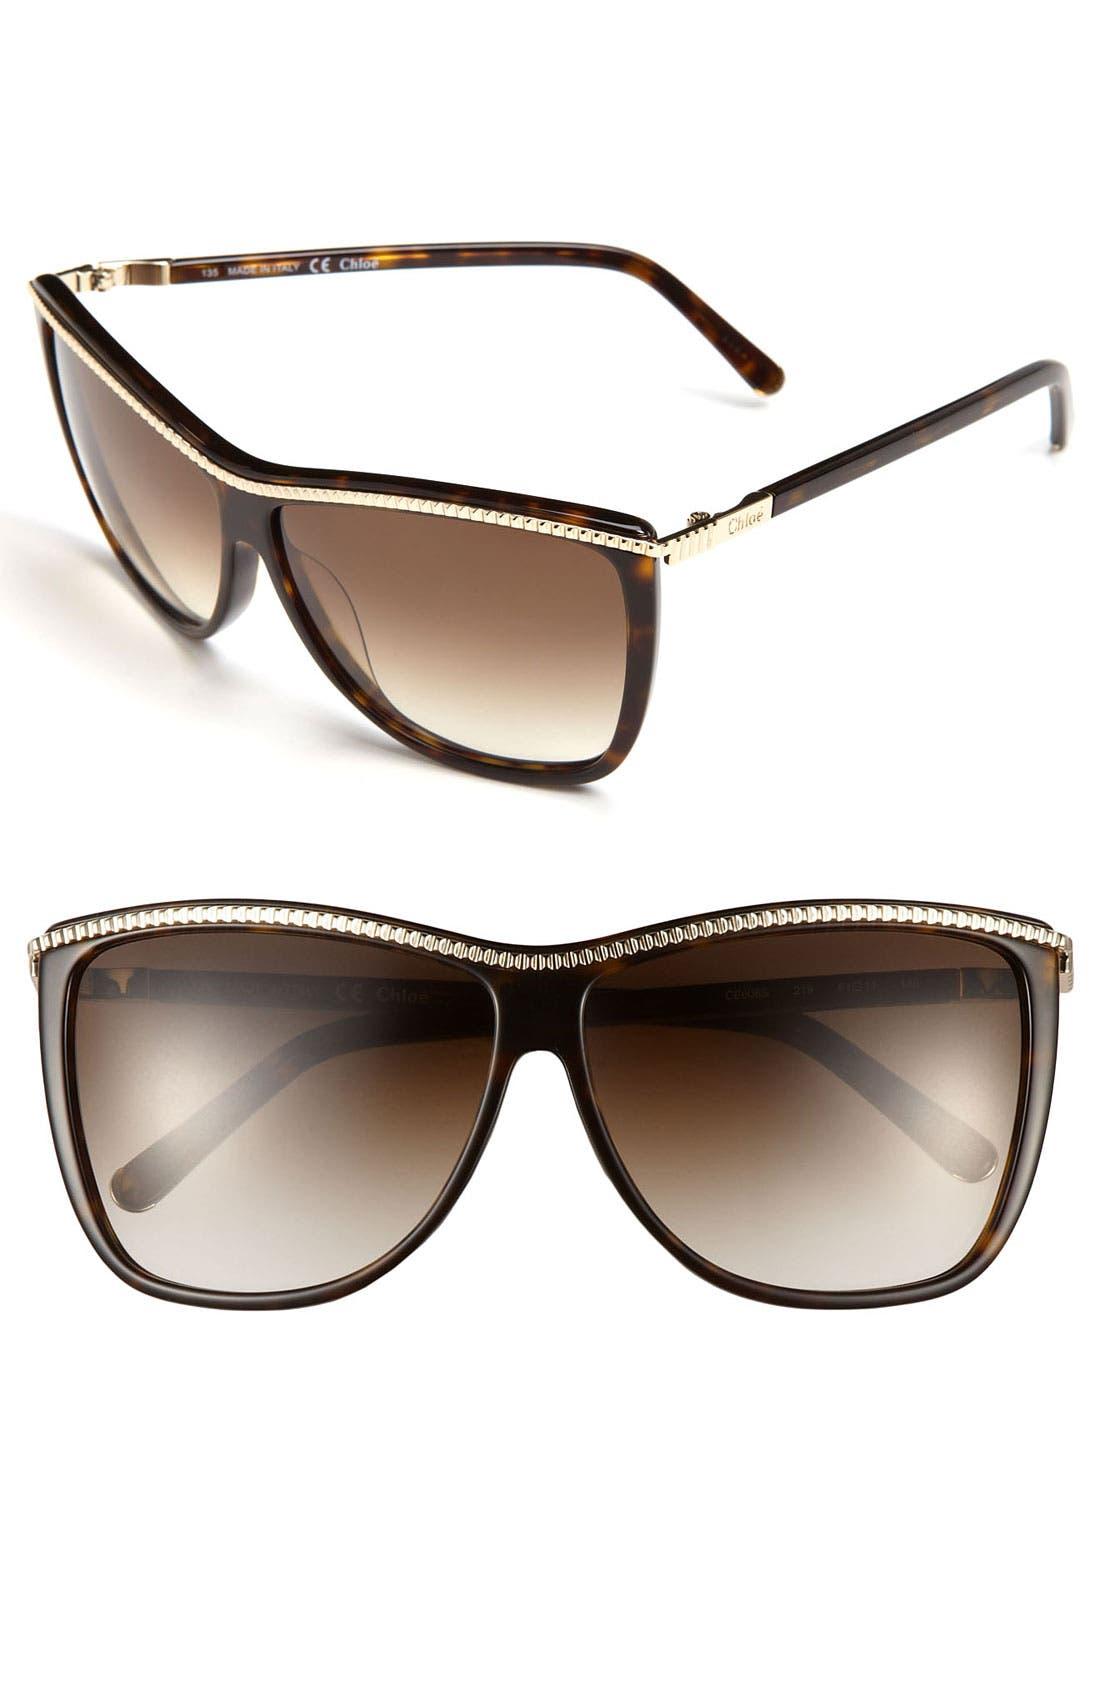 Alternate Image 1 Selected - Chloé 61mm Retro Sunglasses